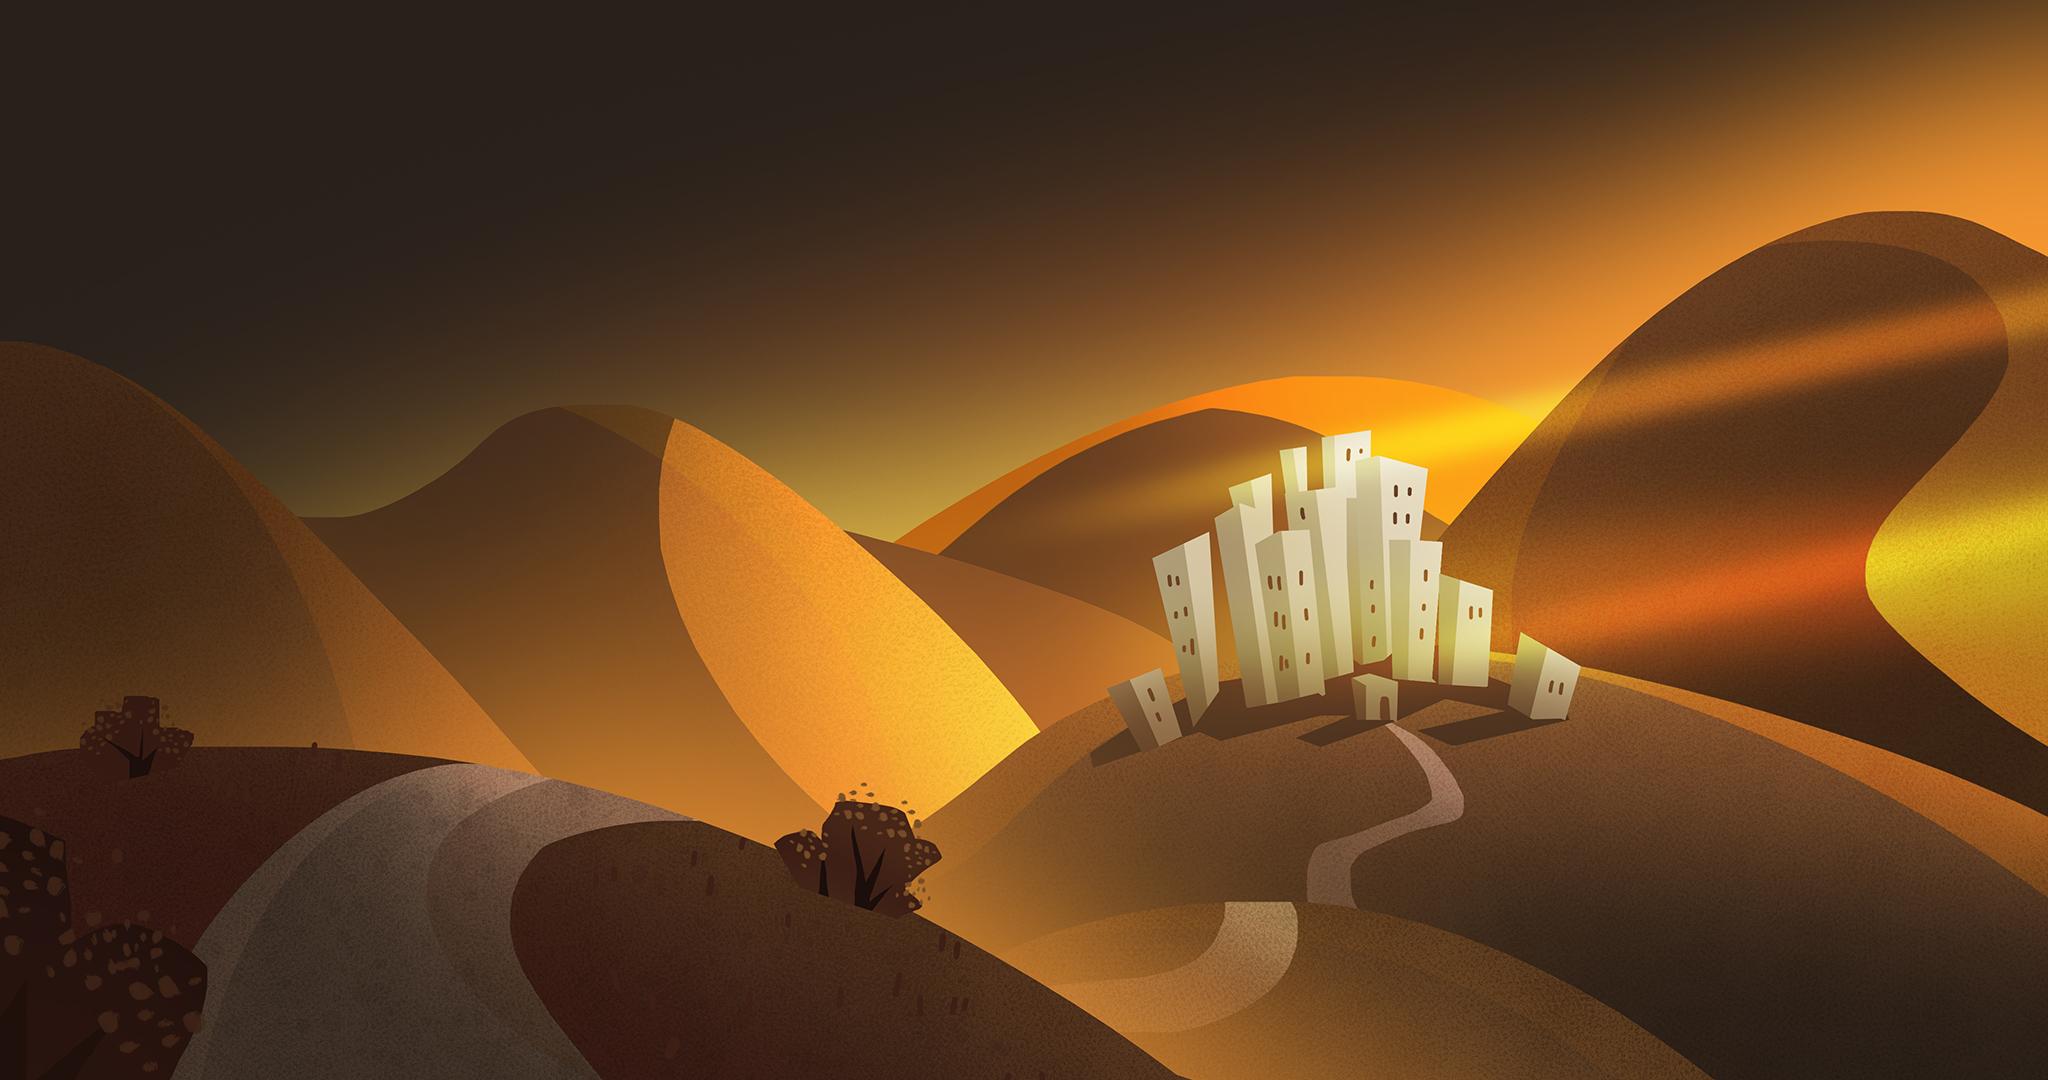 Coastal_Animation_far_bethlehem_01.jpg